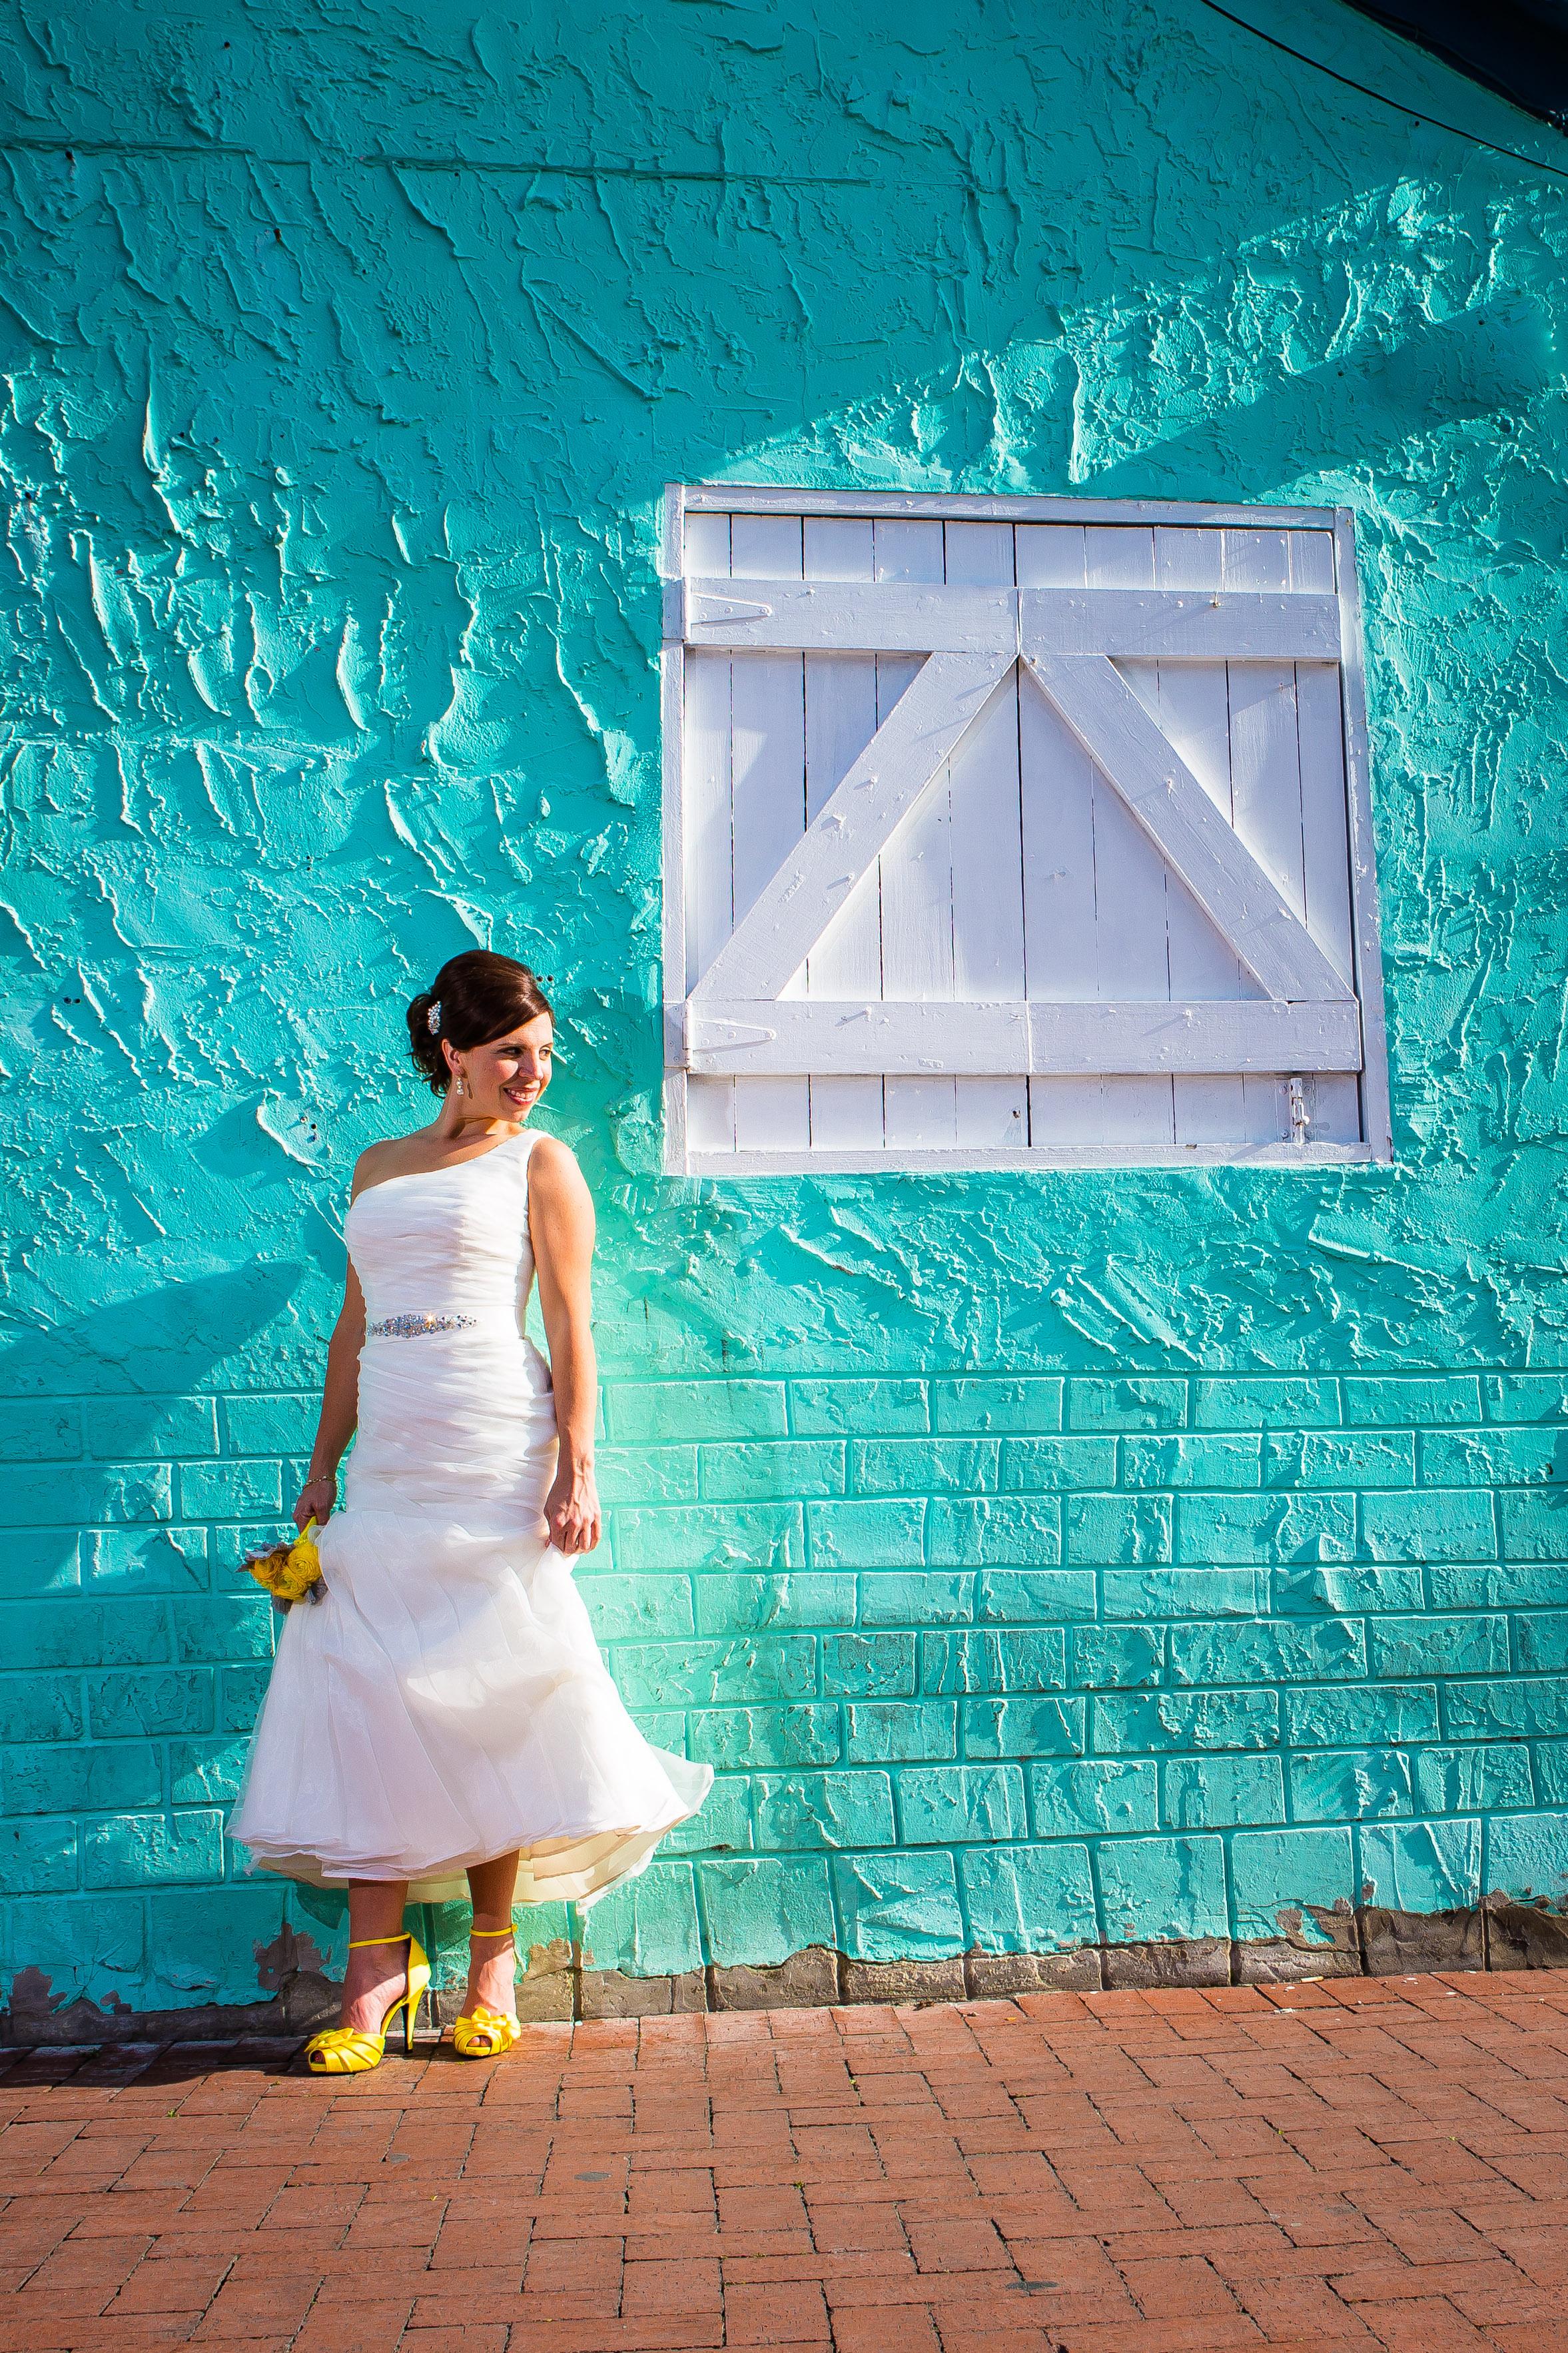 Teal wall with bride posing taken by Karrie Porter.jpg